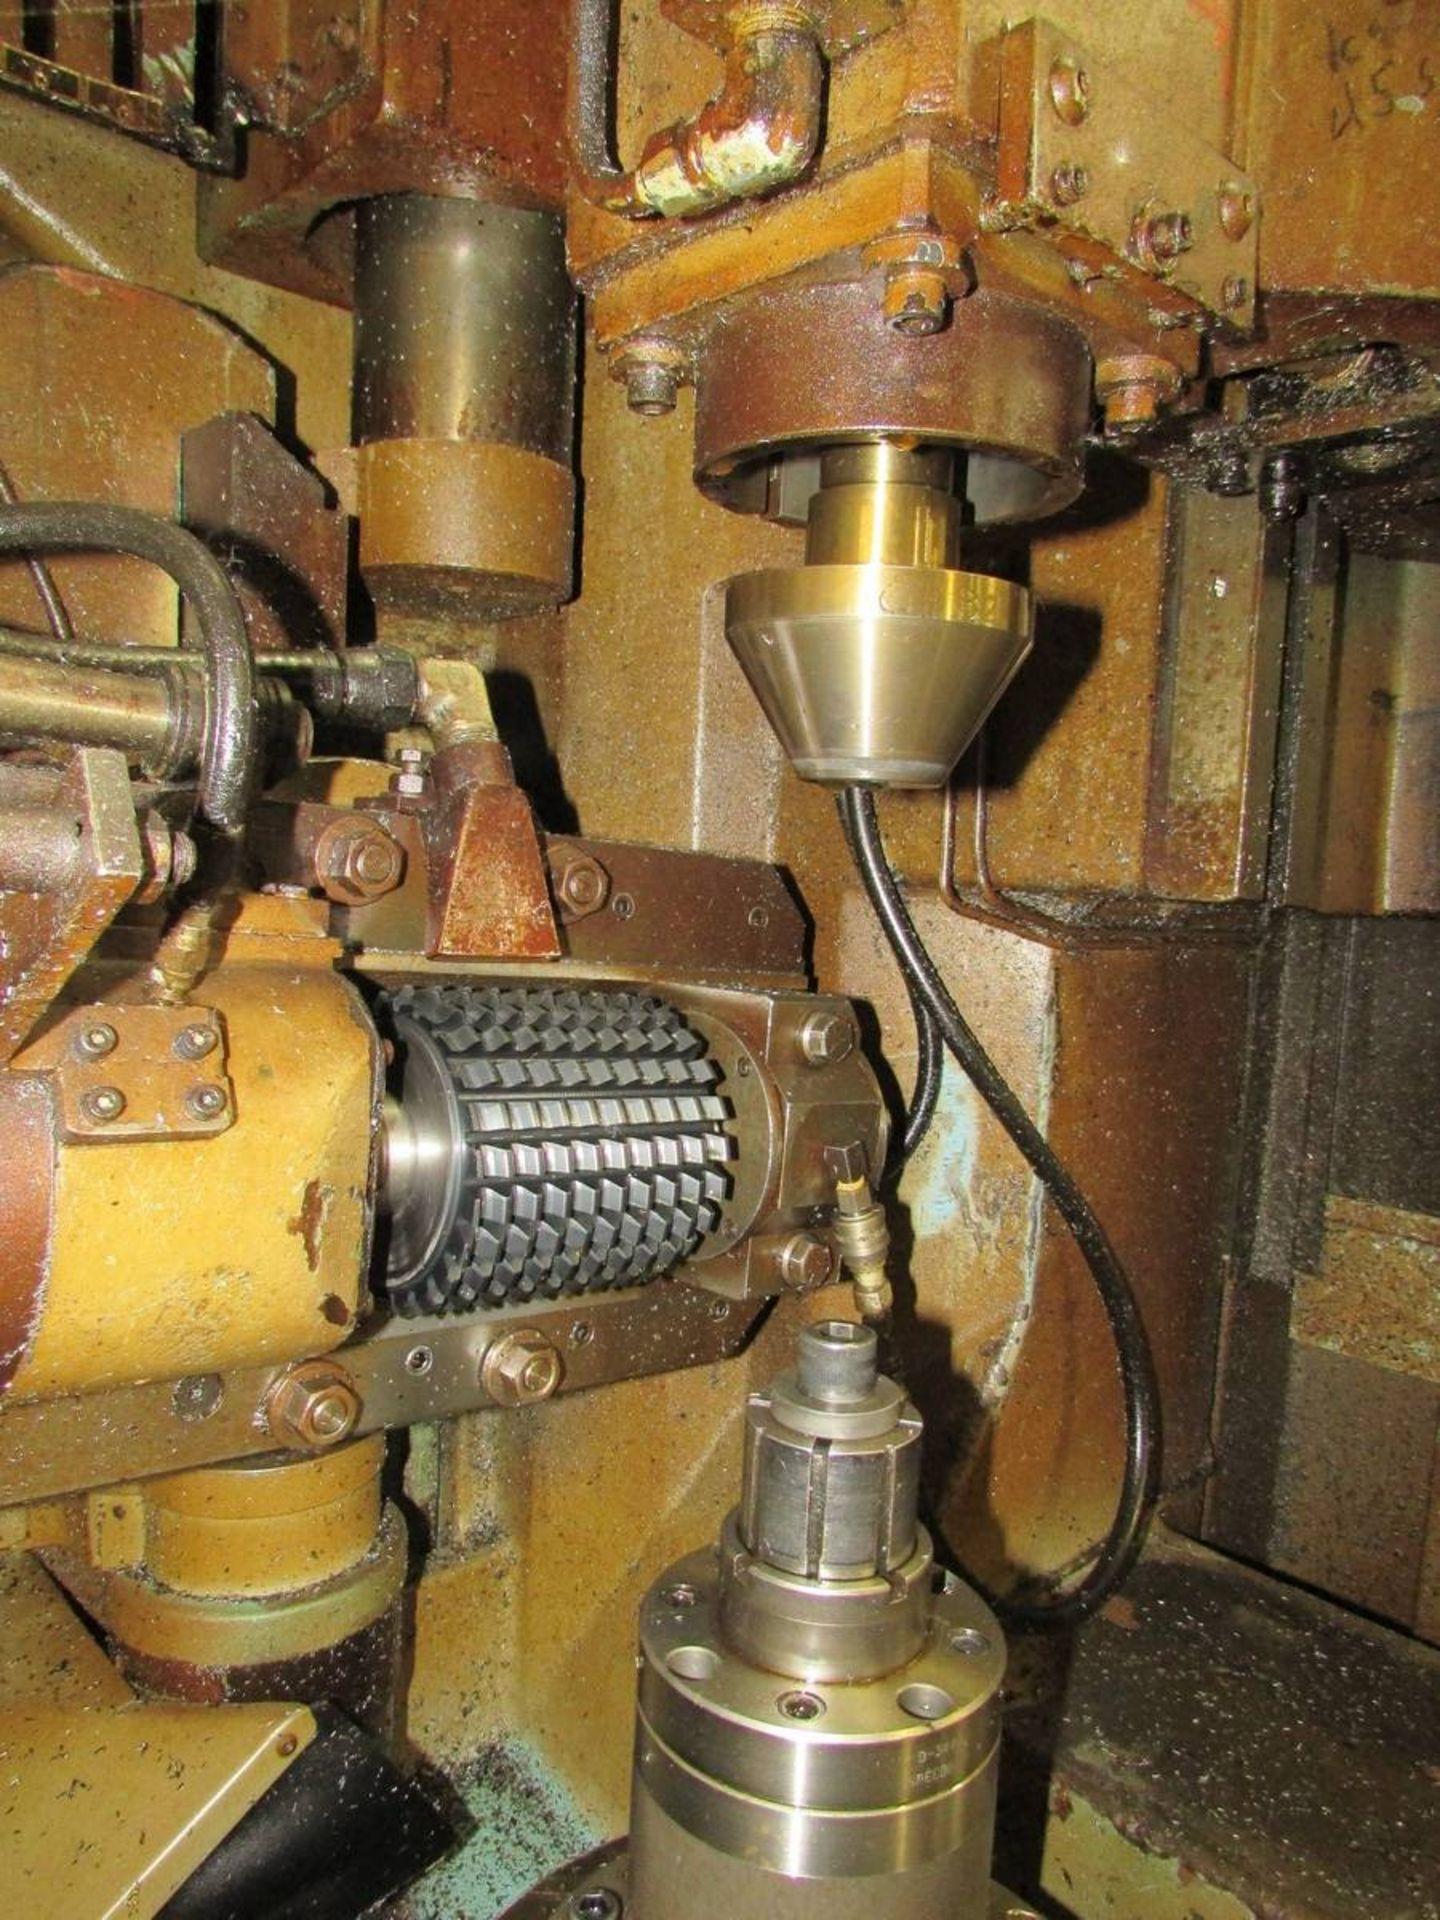 Cleveland/ Waterbury Farrel CR300-612-002 Universal CNC Gear Hobbing Machine - Image 5 of 19